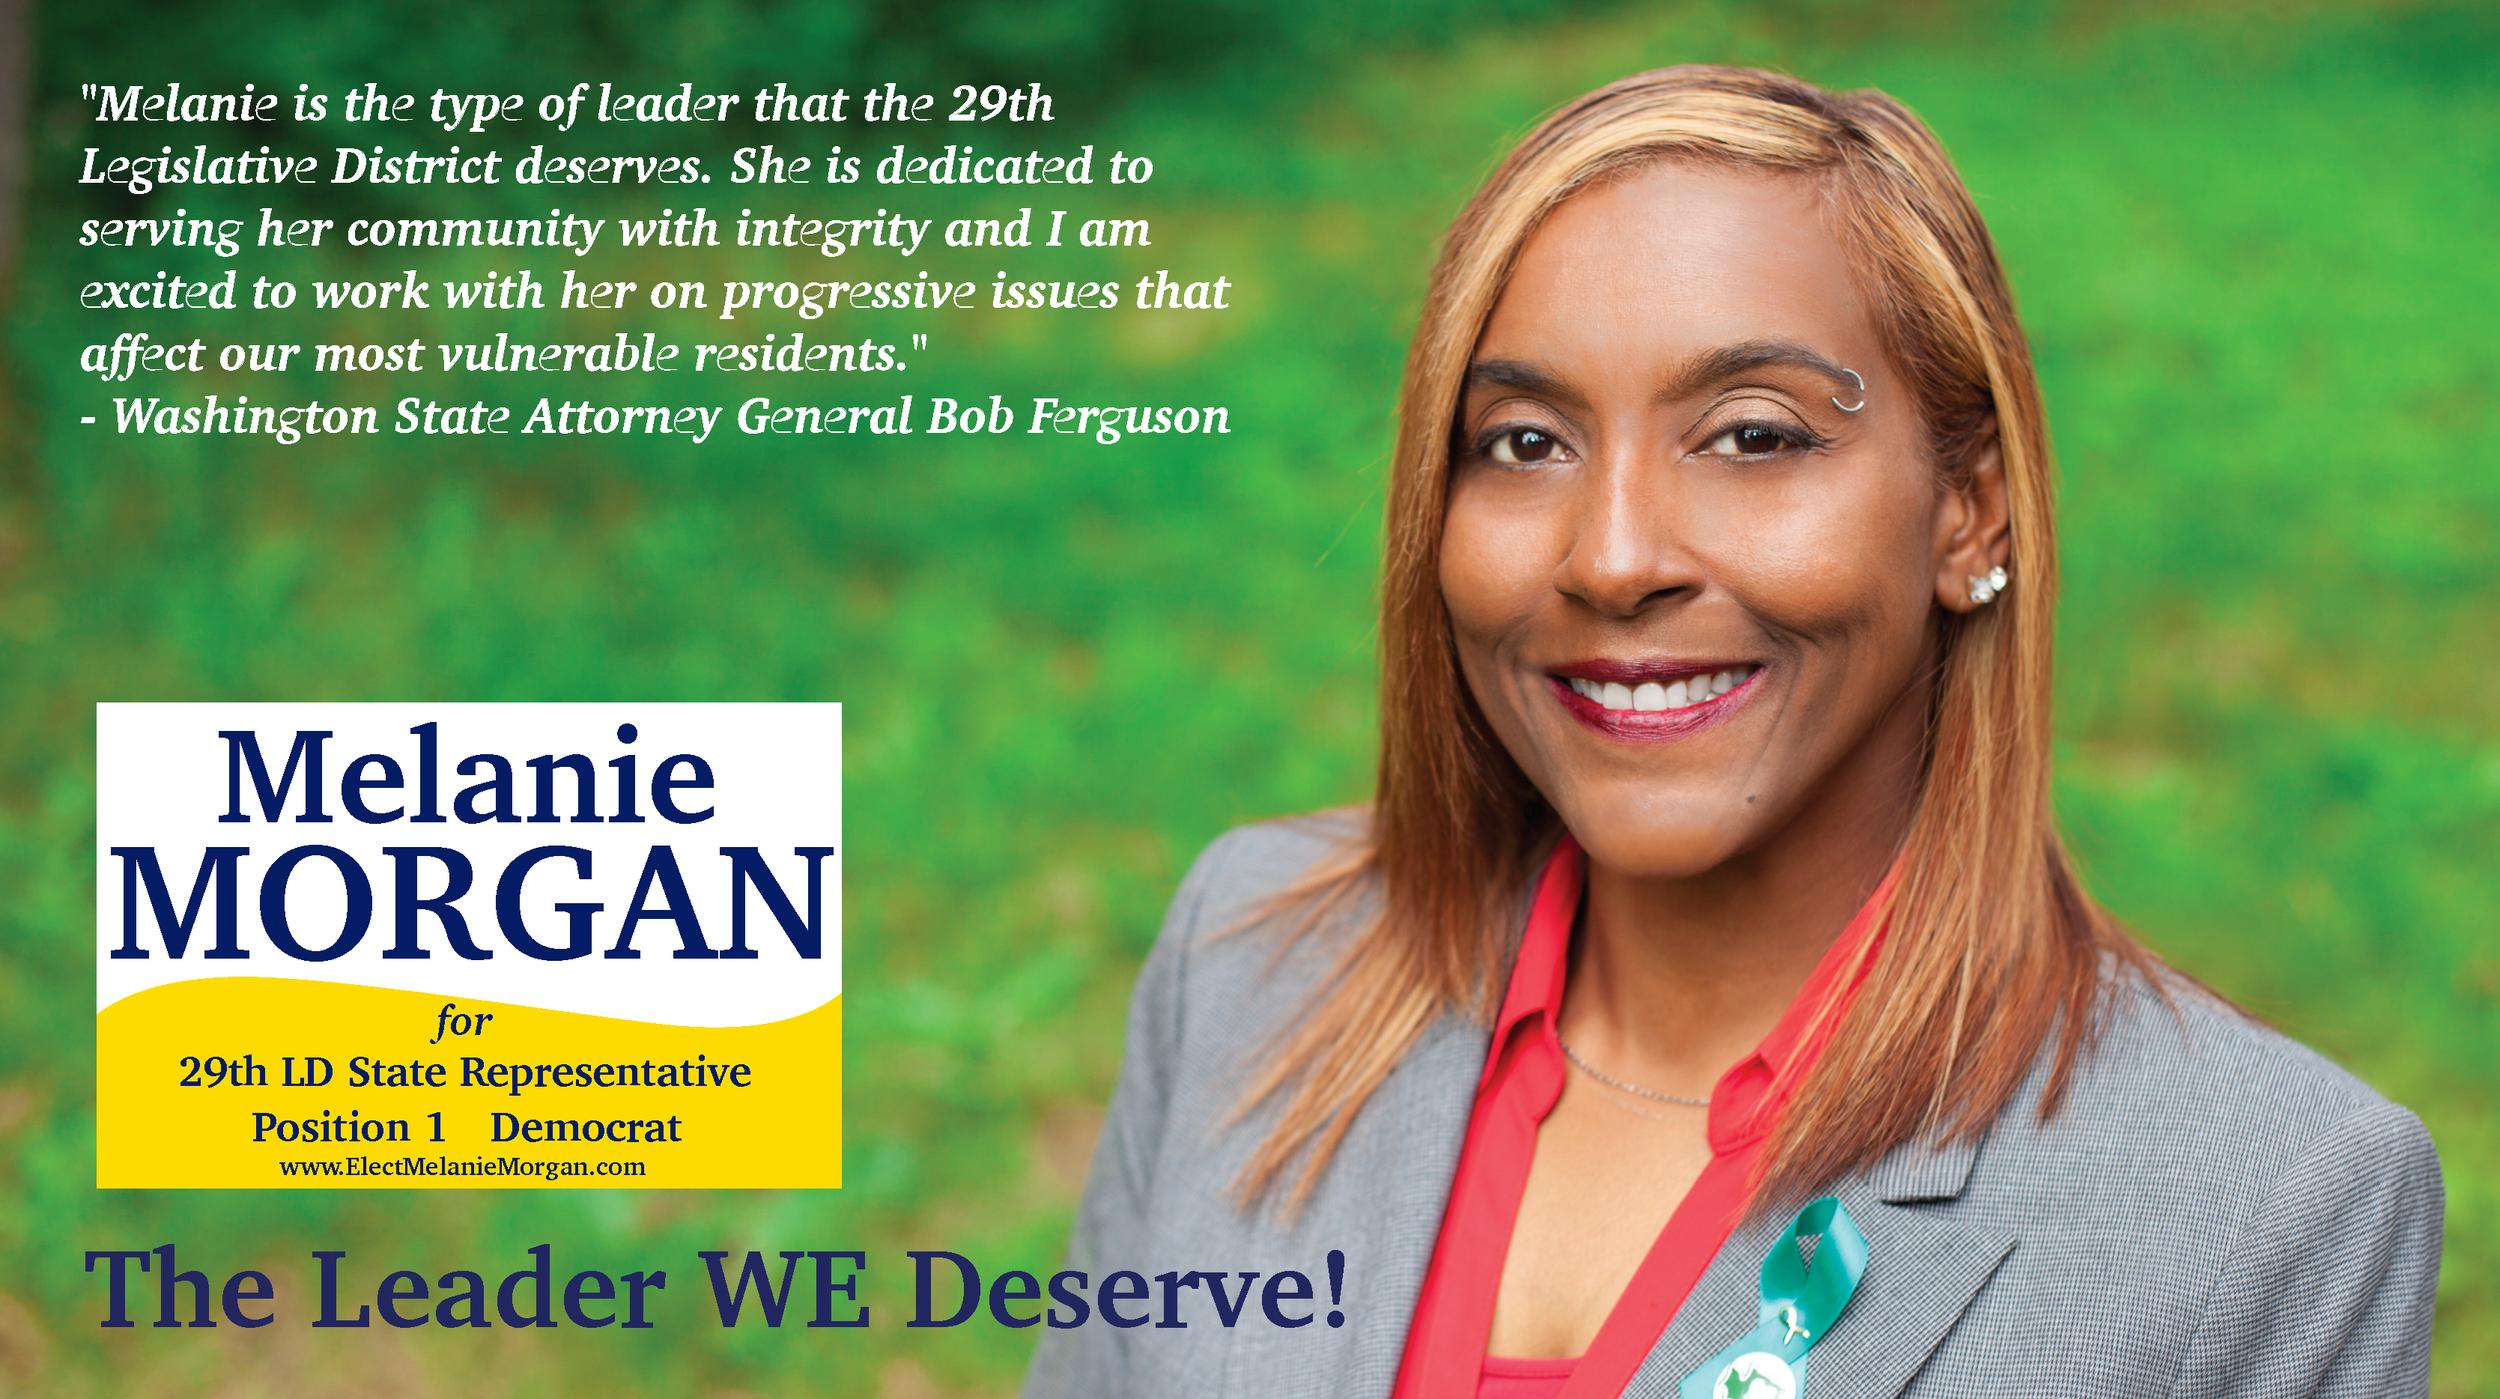 Melanie Morgan for State Representative, 29th LD